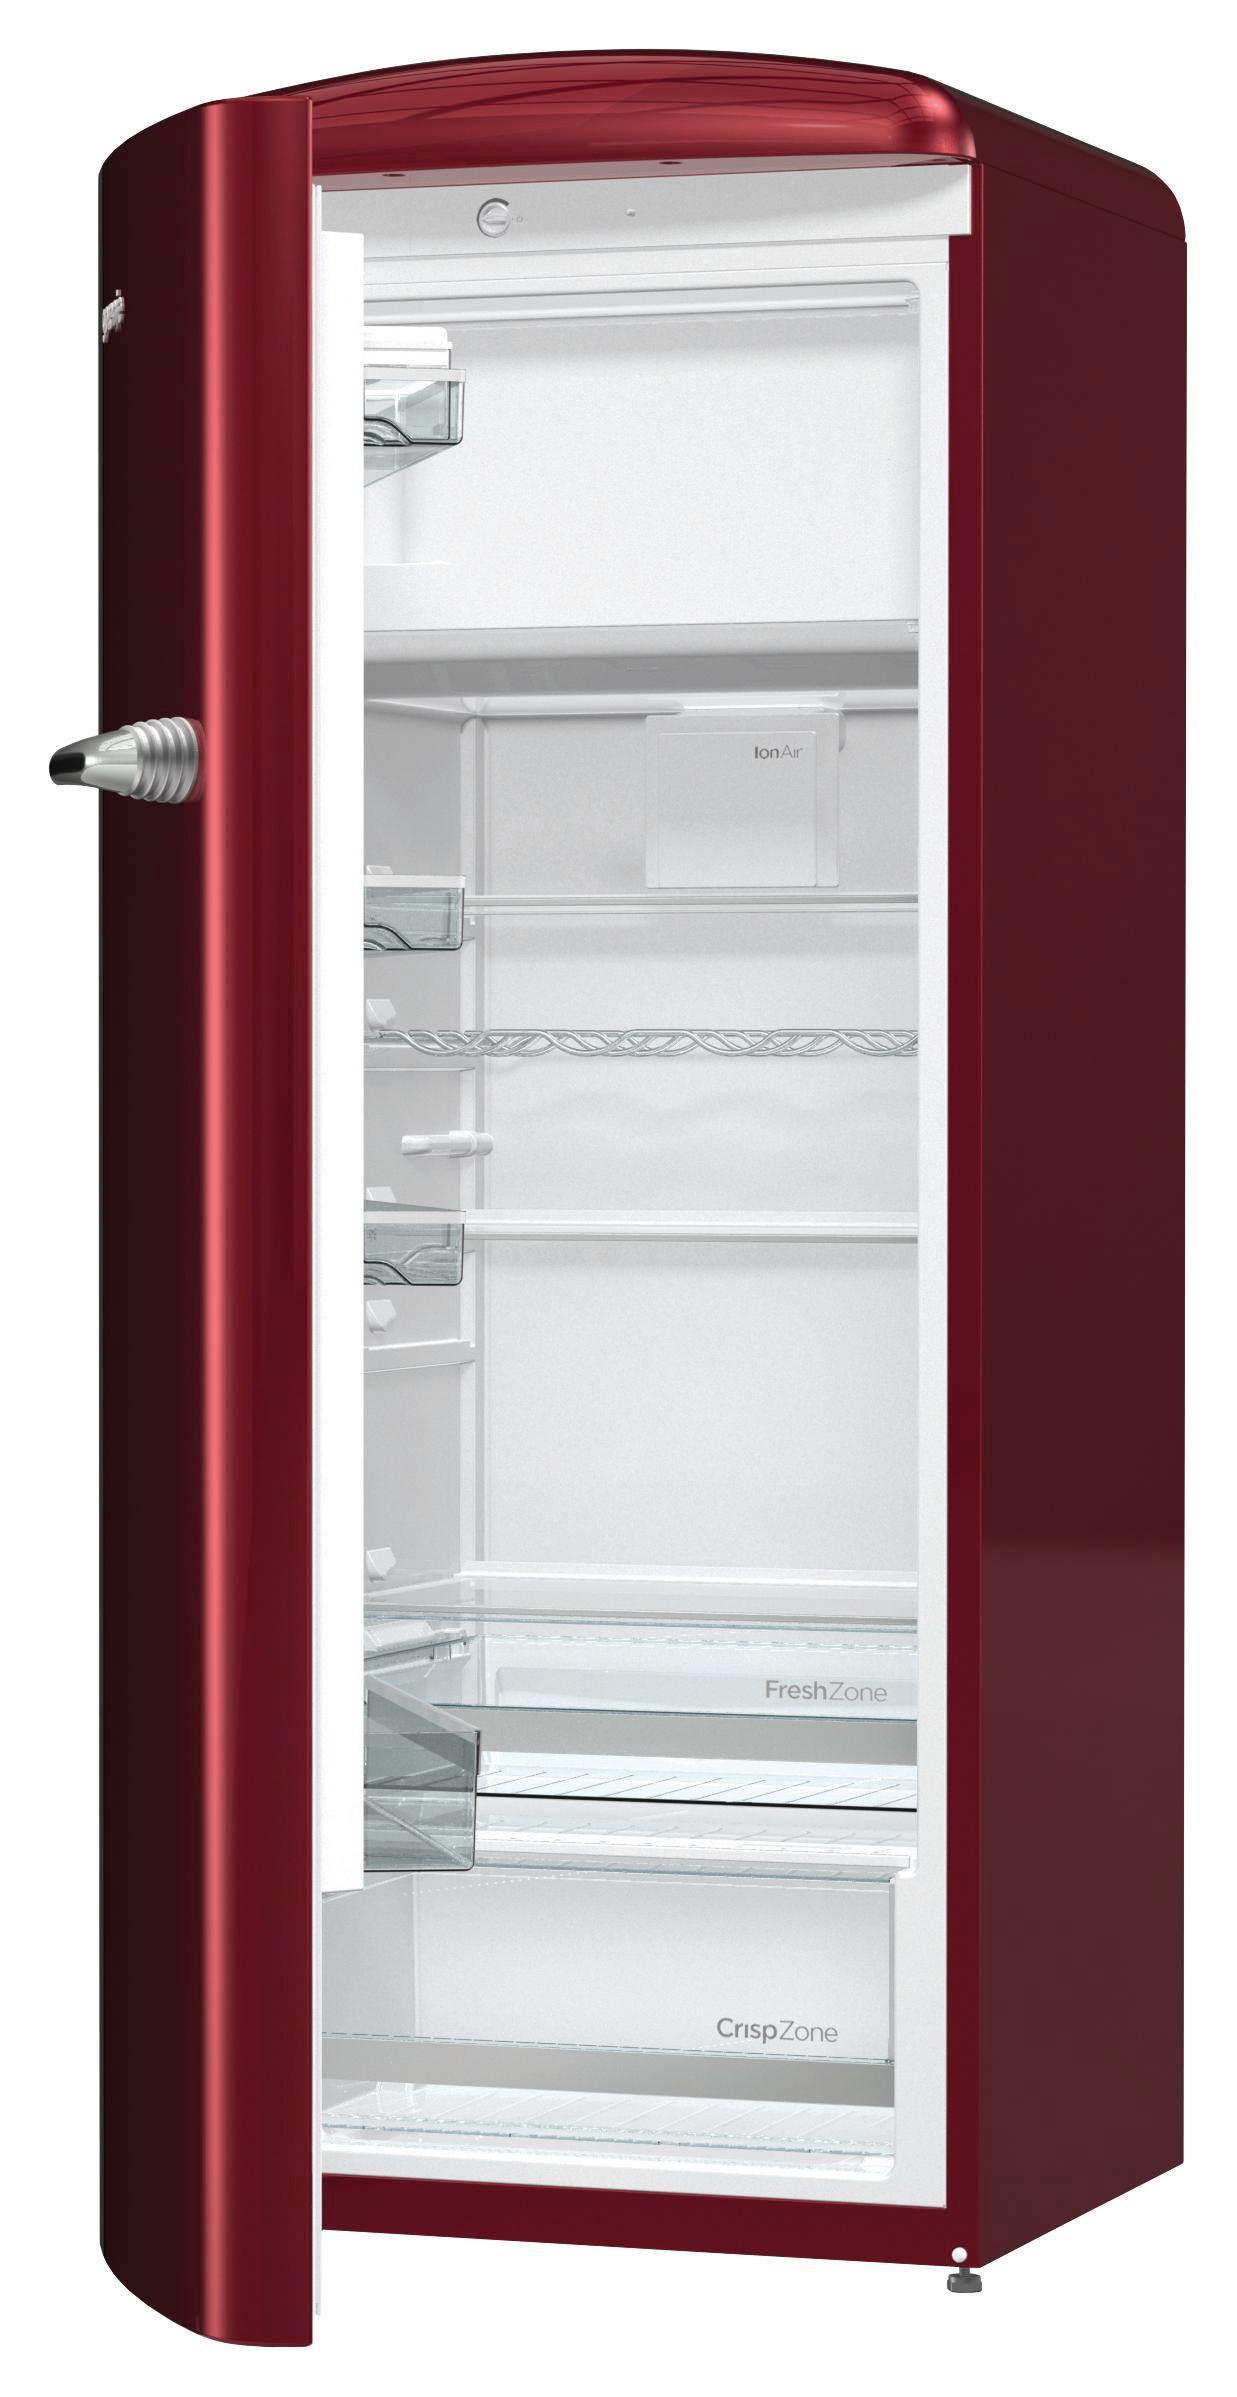 Gorenje Kühlschrank Edelstahl : Gorenje kühlschrank orb r l online kaufen ➤ möbelix